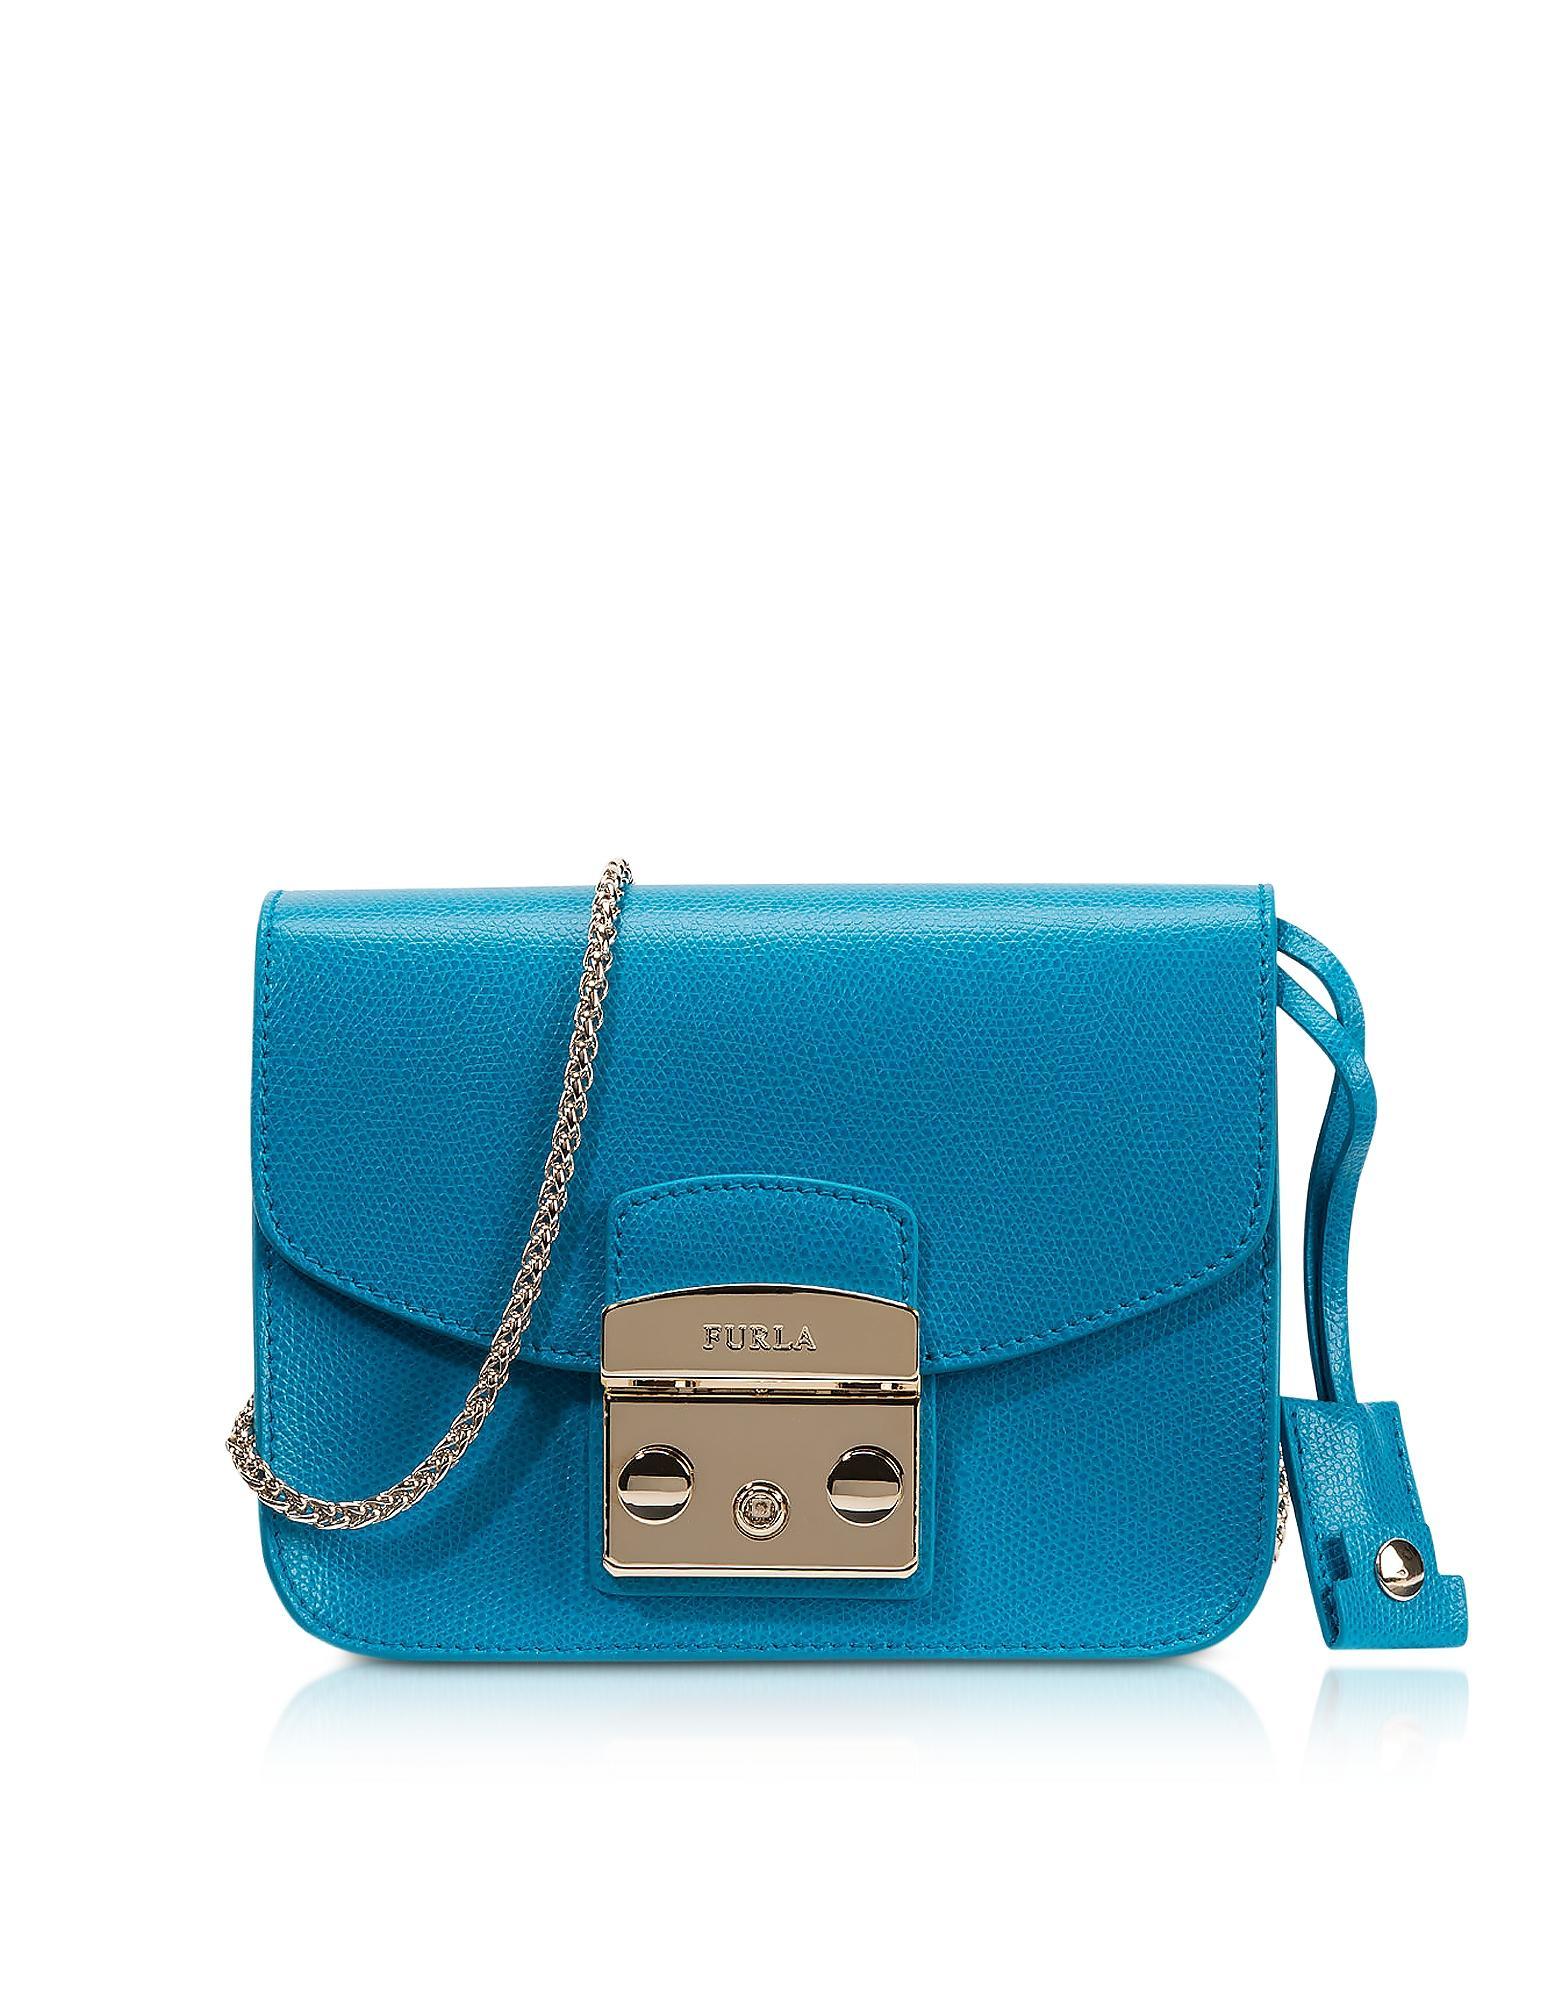 Lyst Furla Metropolis Turquoise Leather Mini Crossbody Bag In Blue Gallery Womens